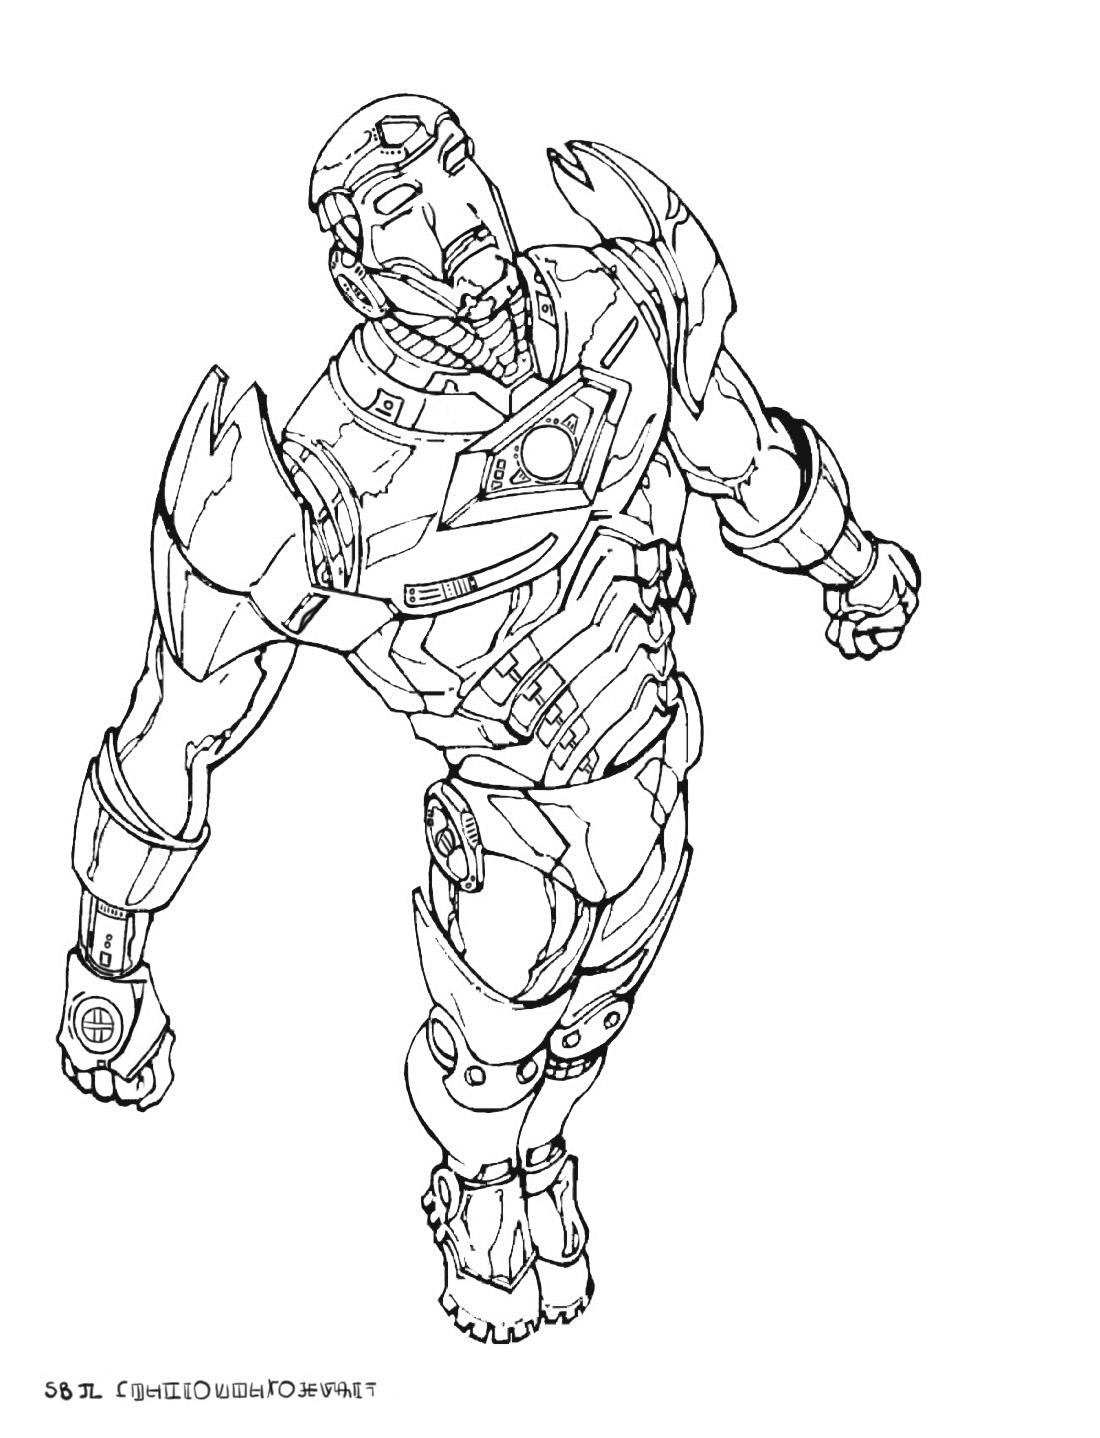 92 dibujos de iron man para colorear oh kids page 4 - Comics dessin ...